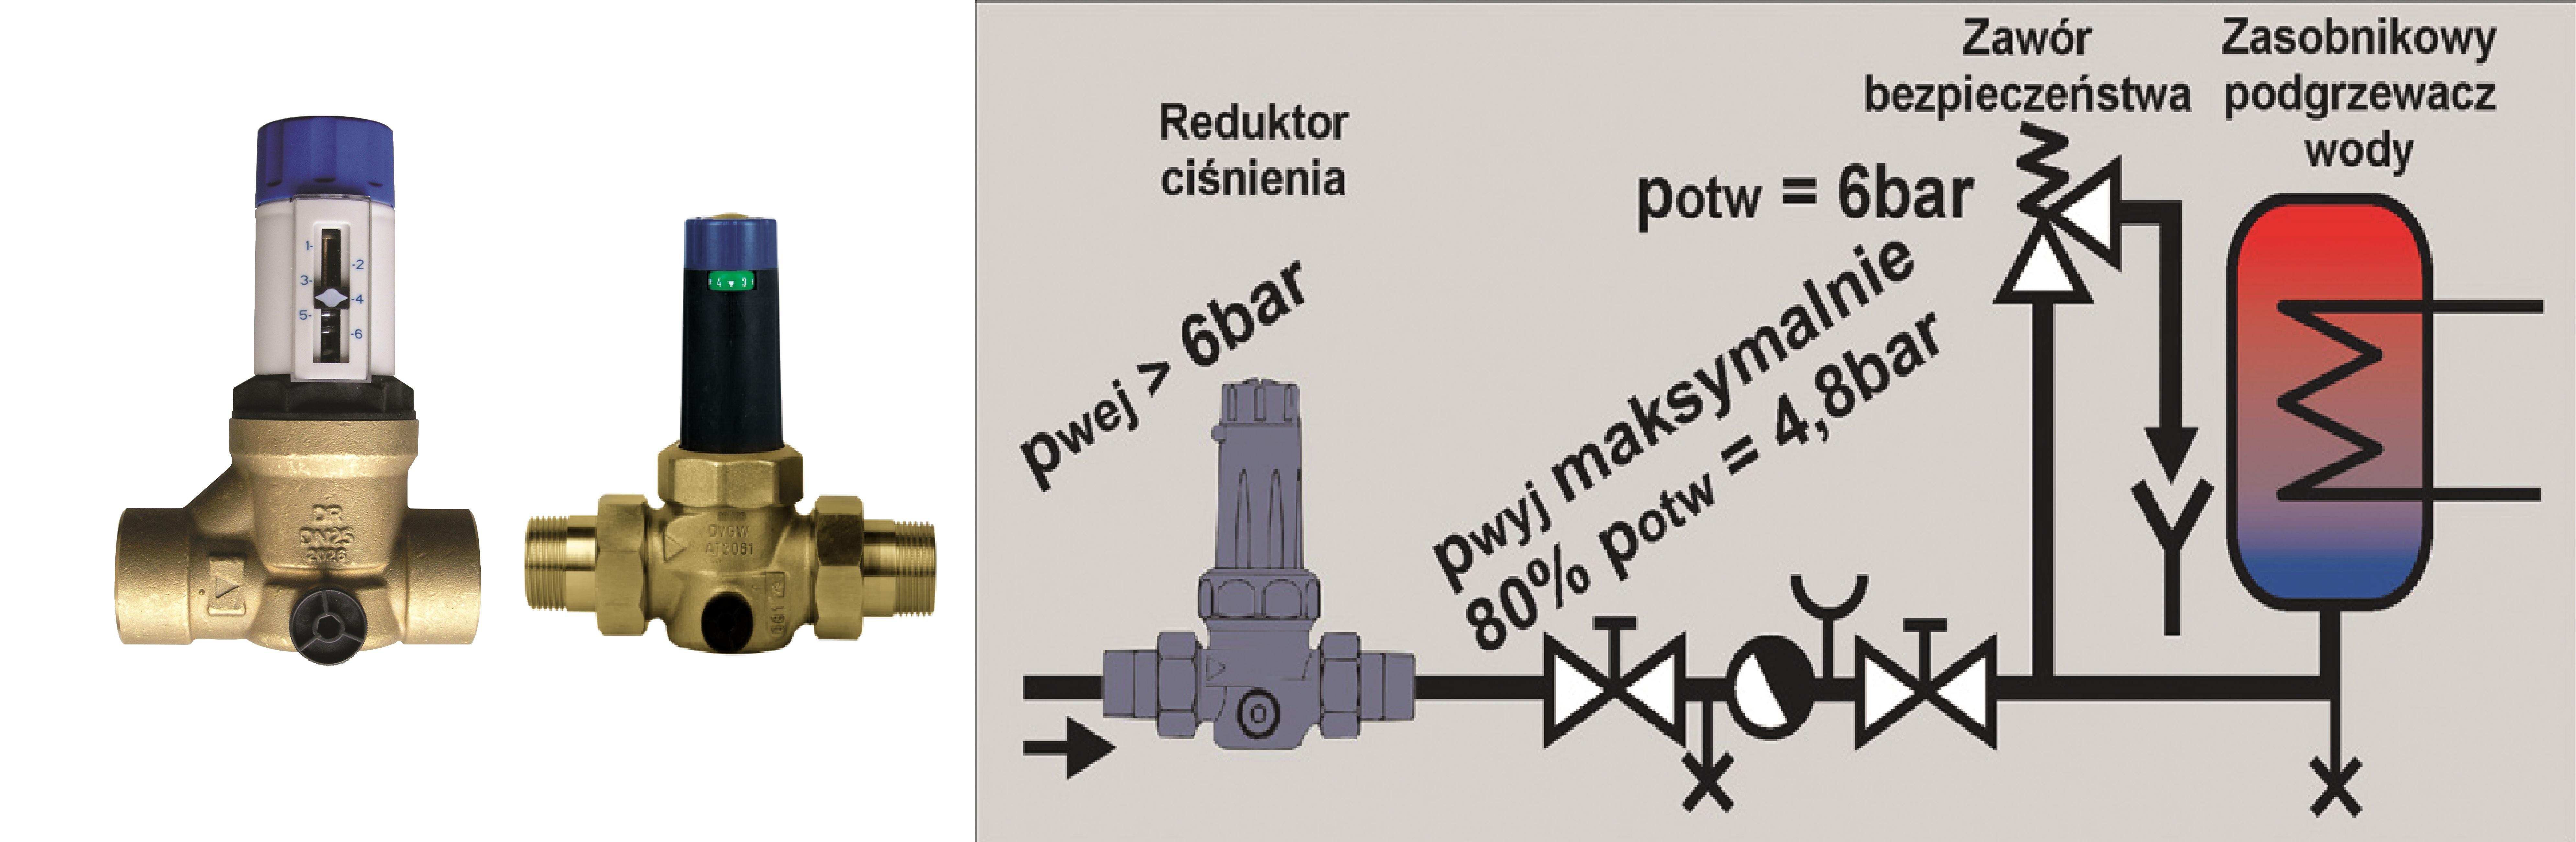 obniżone ciśnienie i montaż